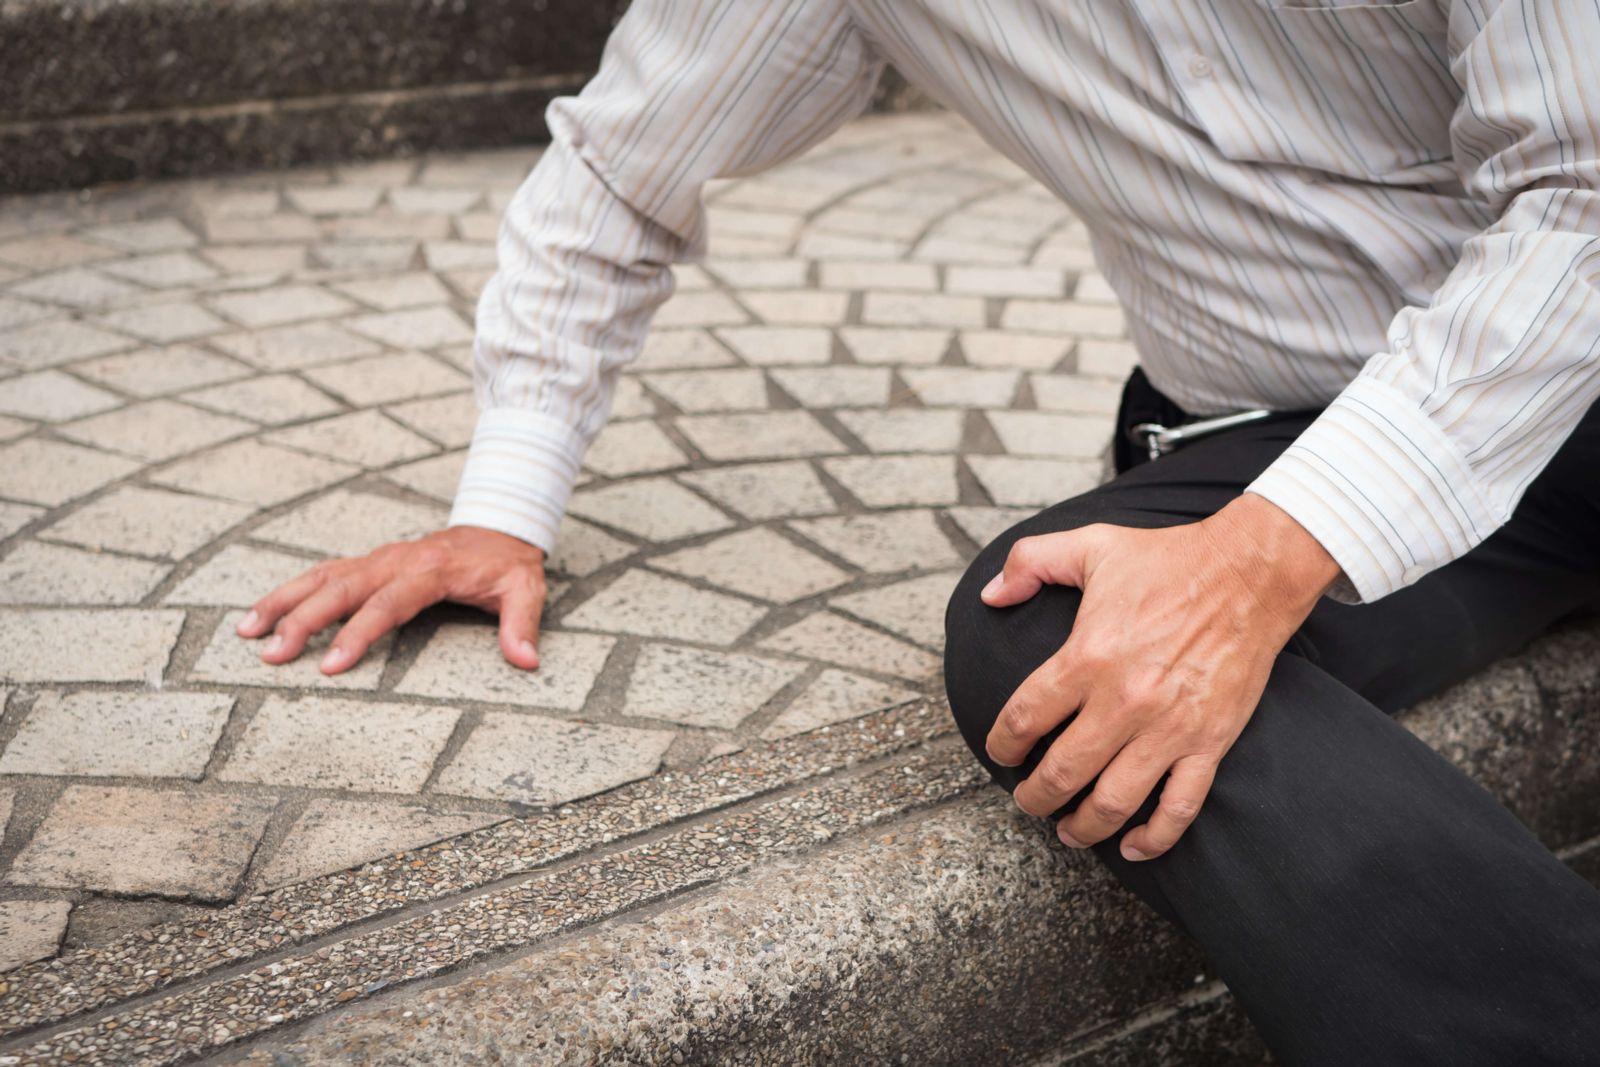 Kansas City Slip and Fall Attorneys | Premises Liability